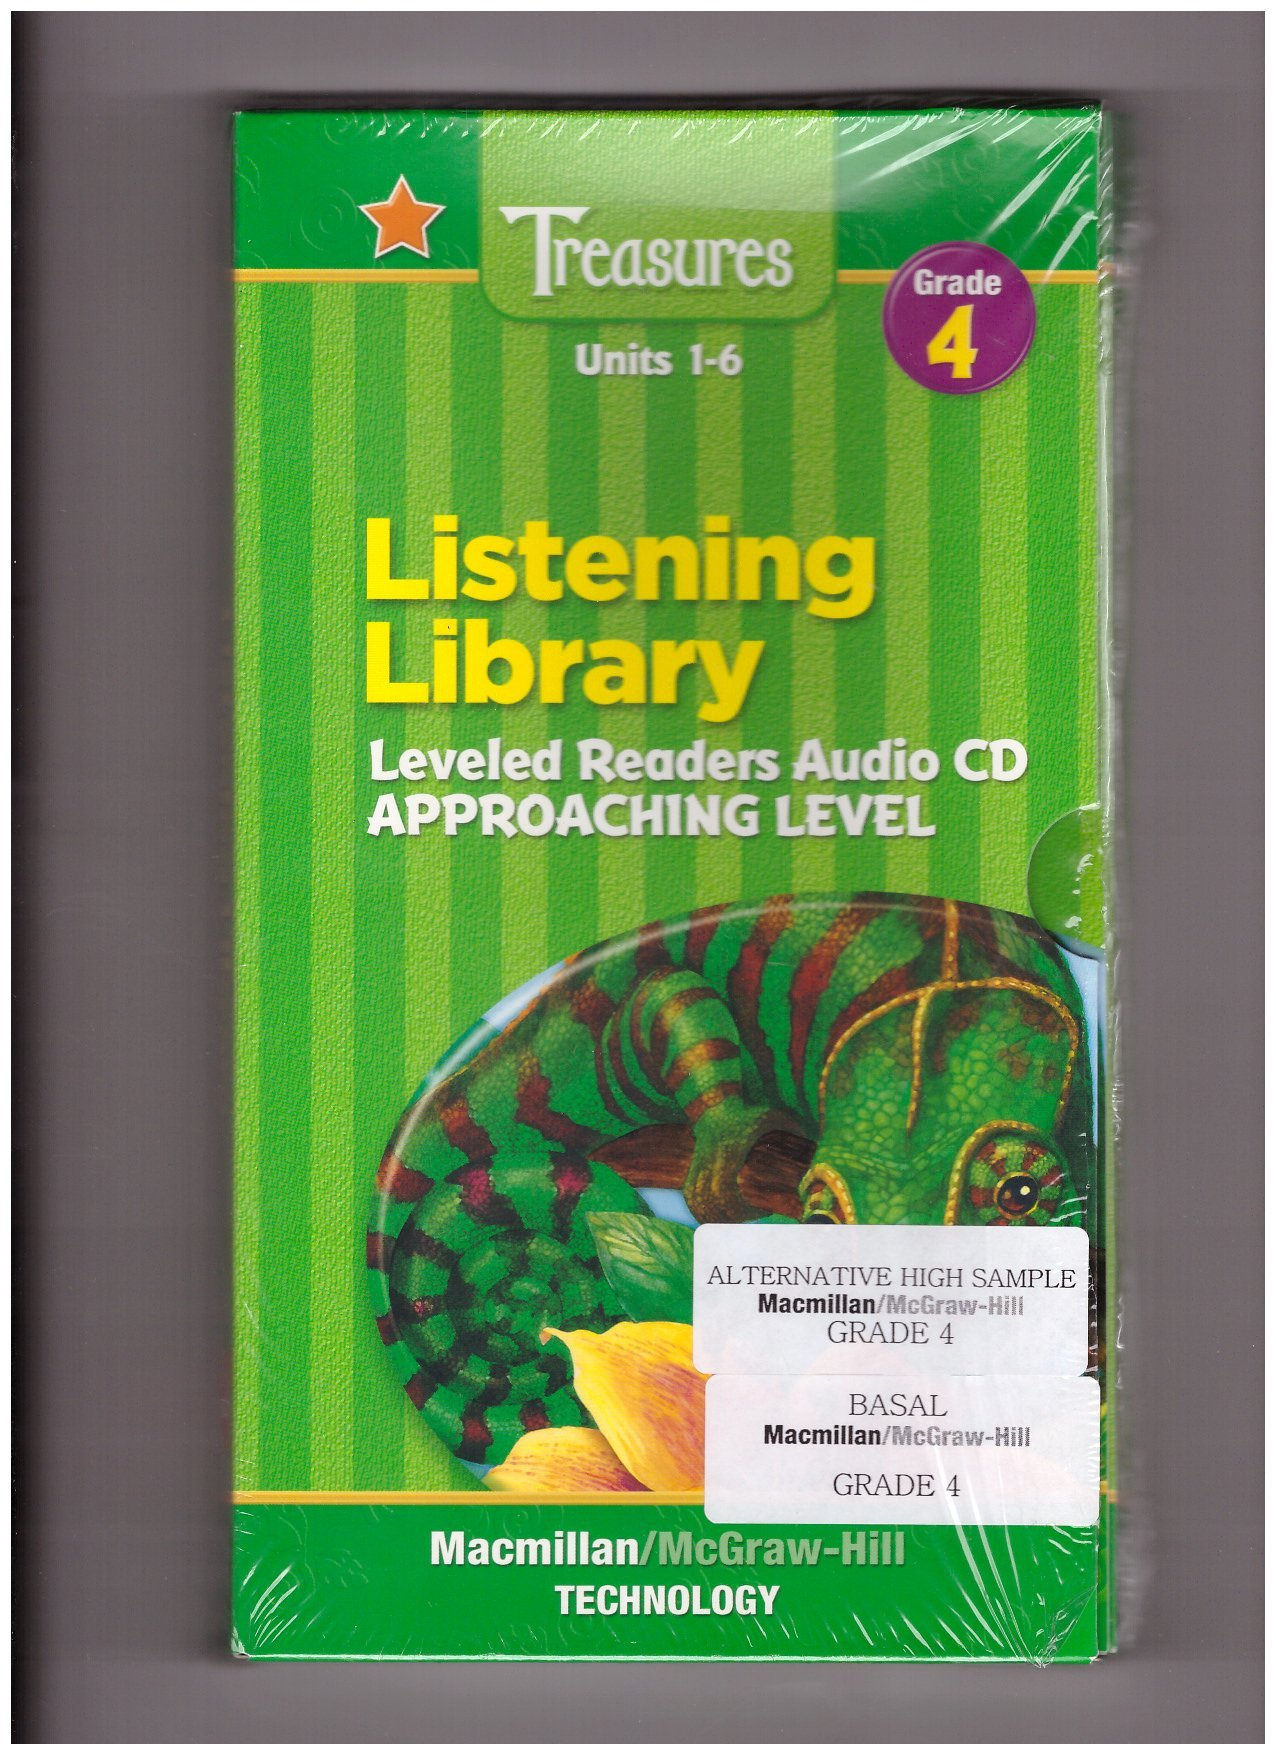 Units 1-6 Listening Library Leveled Readers Audio CD Approaching Level  (Macmillan McGraw-Hill Treasures : a reading/language arts program. grade  4): Donald ...